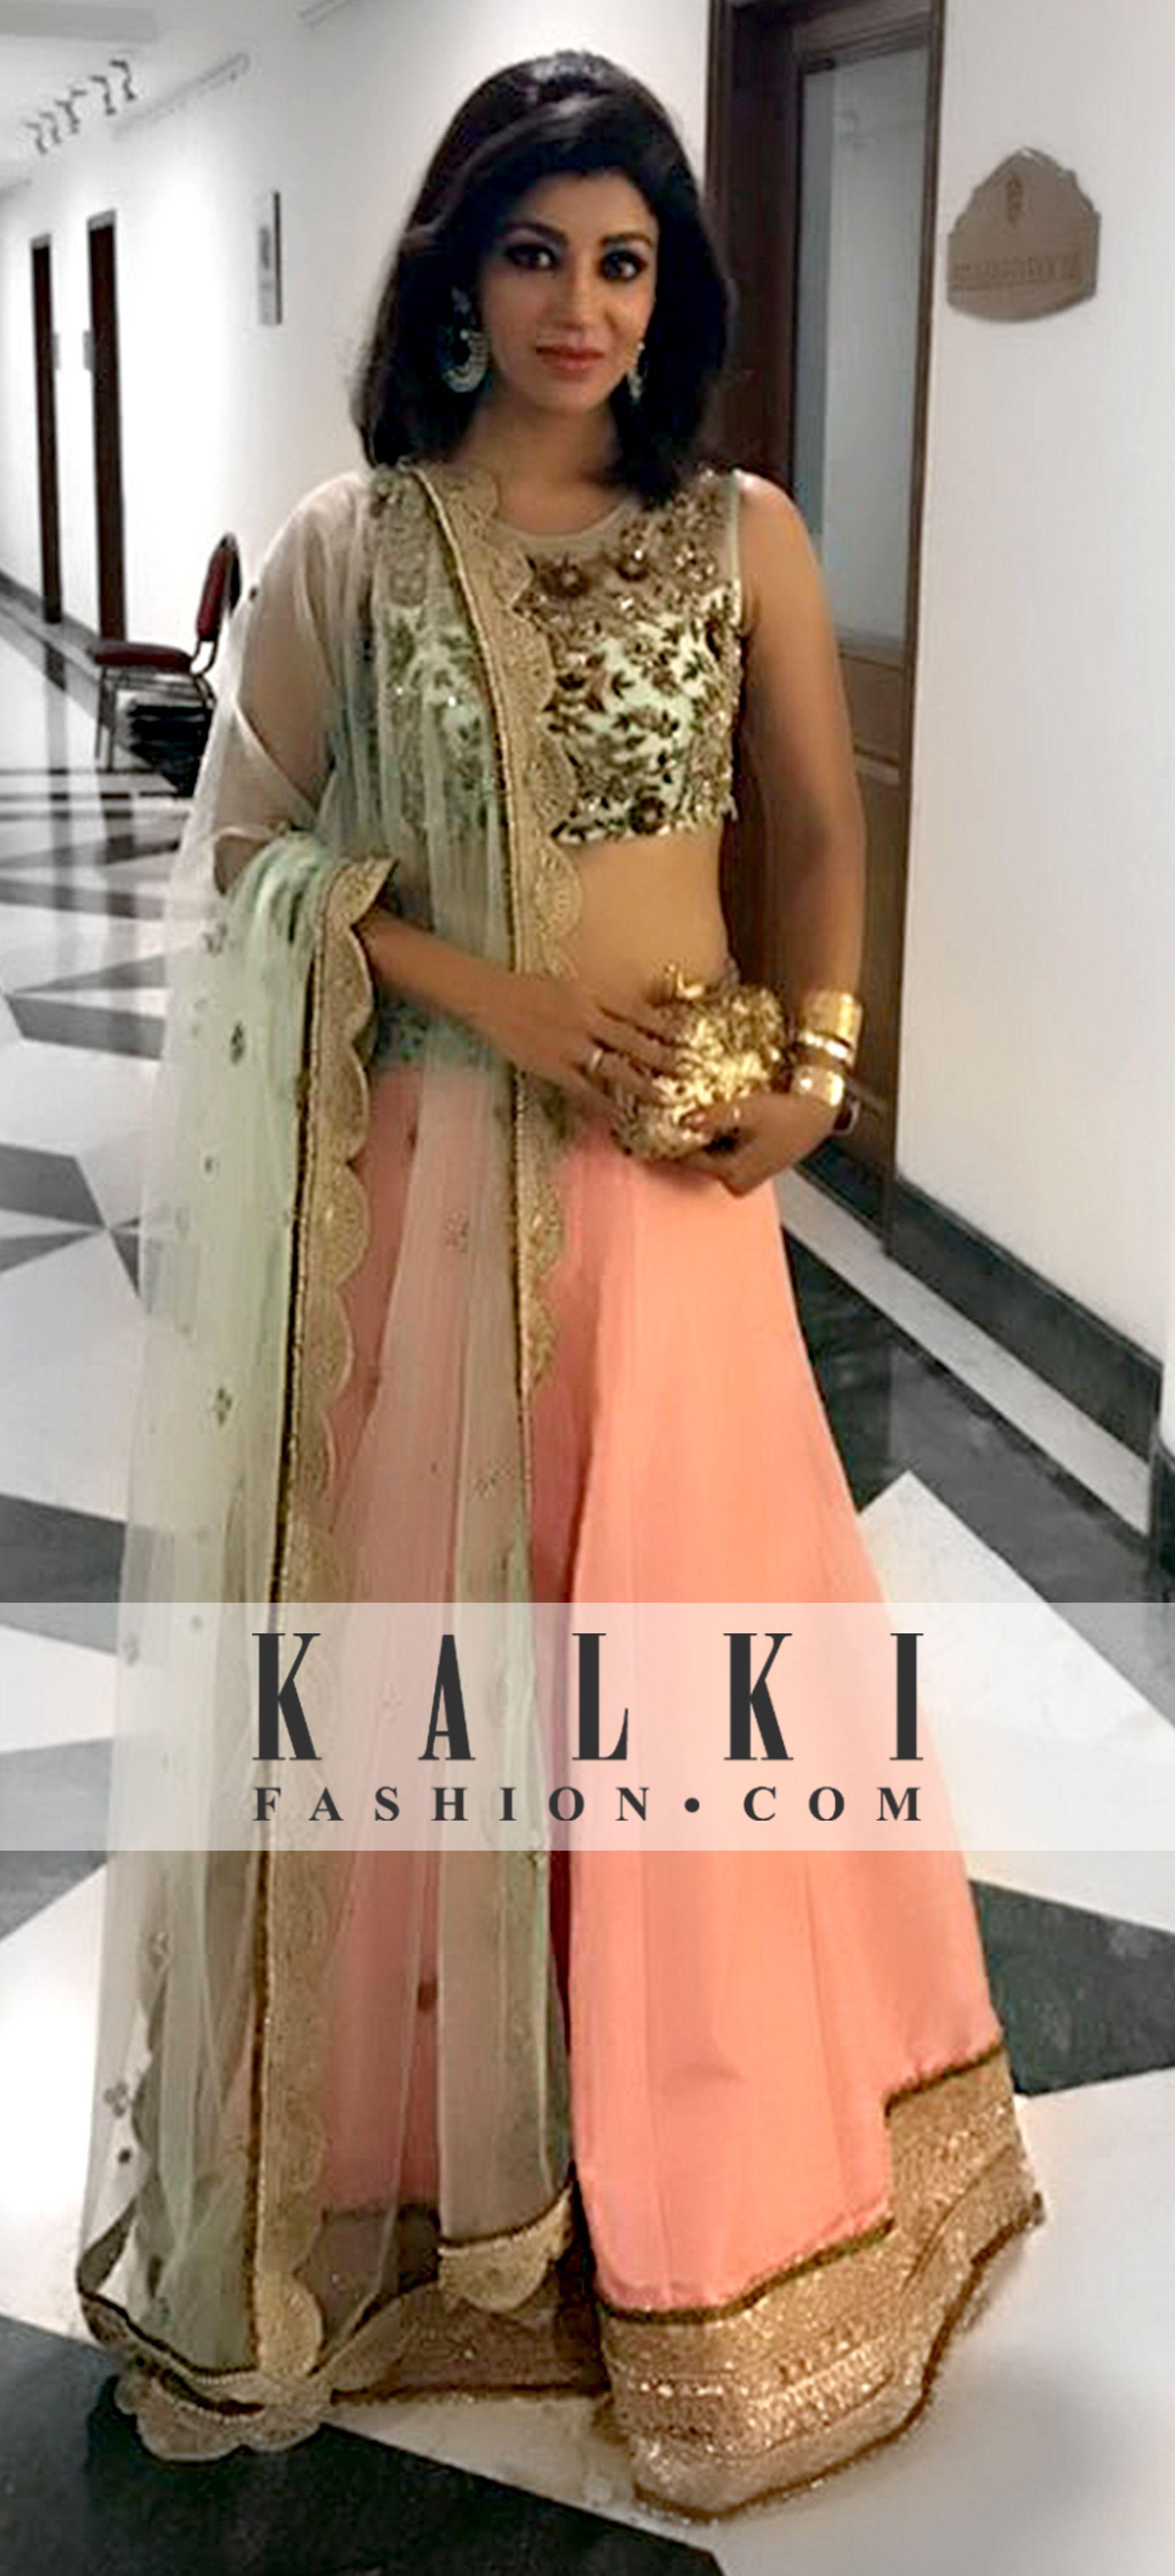 Debina Bonnerjee Kalki Celebrity Favourite Styles Pinterest Jfashion Etchnic Long Tunik Fashion Elegan Shareen Indian Suits Wear Bollywood Style Clothes